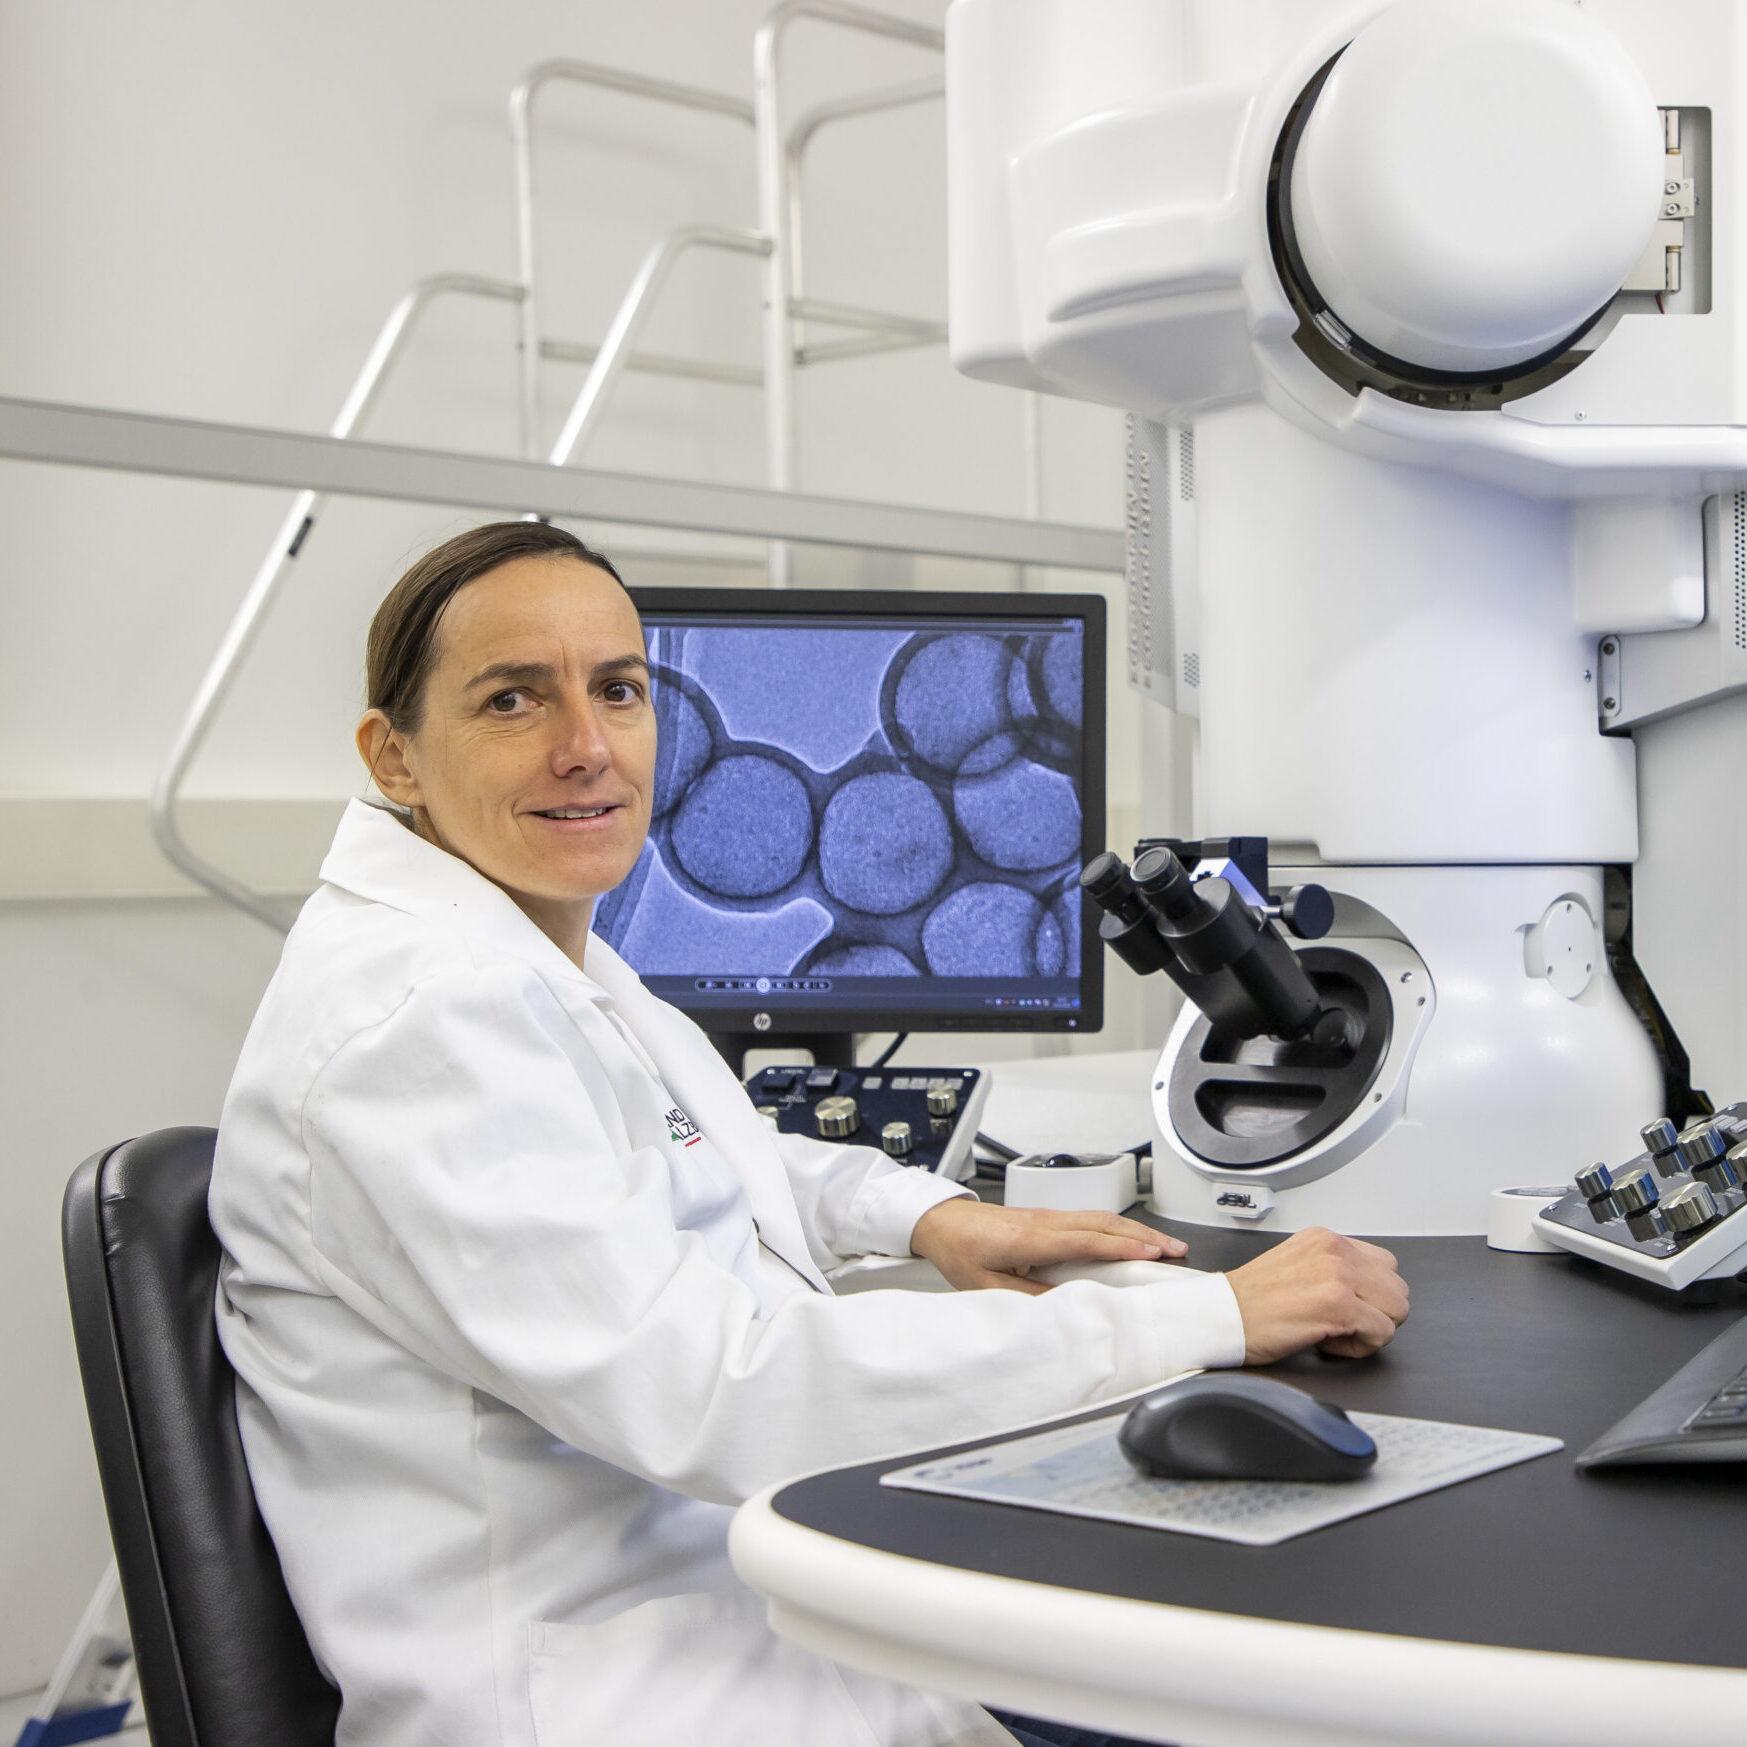 Foto: Simone Pokrant vor dem Mikroskop - Fotonachweis: Kolarik